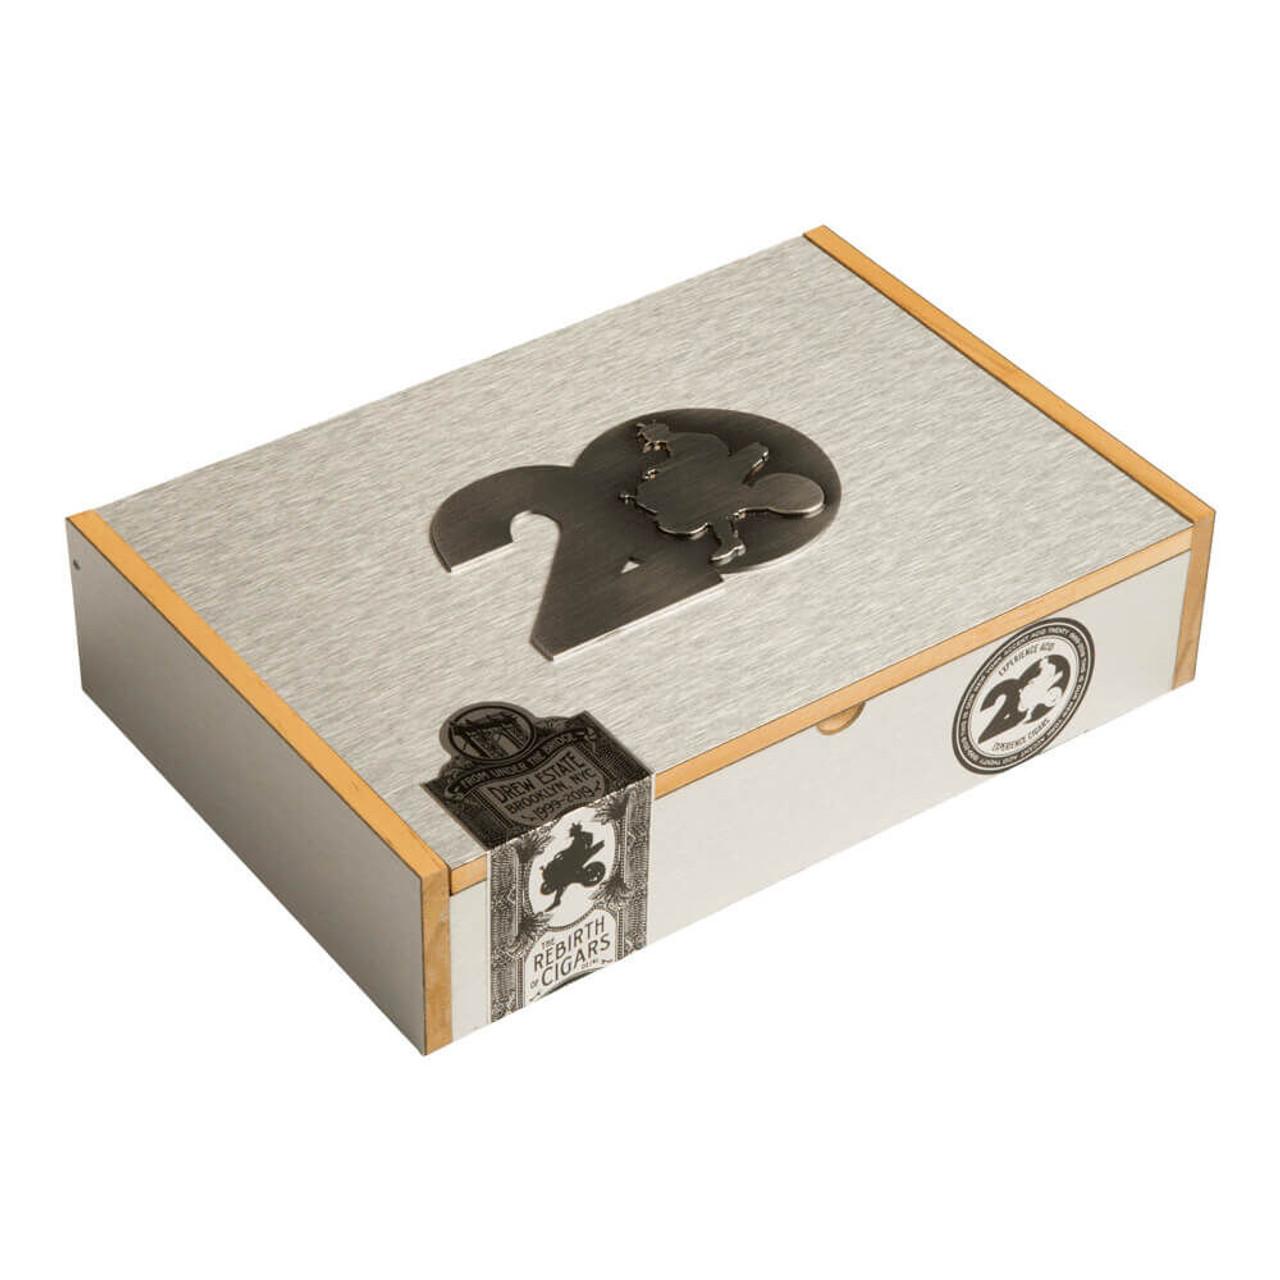 ACID 20th Anniversary Box Press Cigars - 5 x 52 (Box of 24)